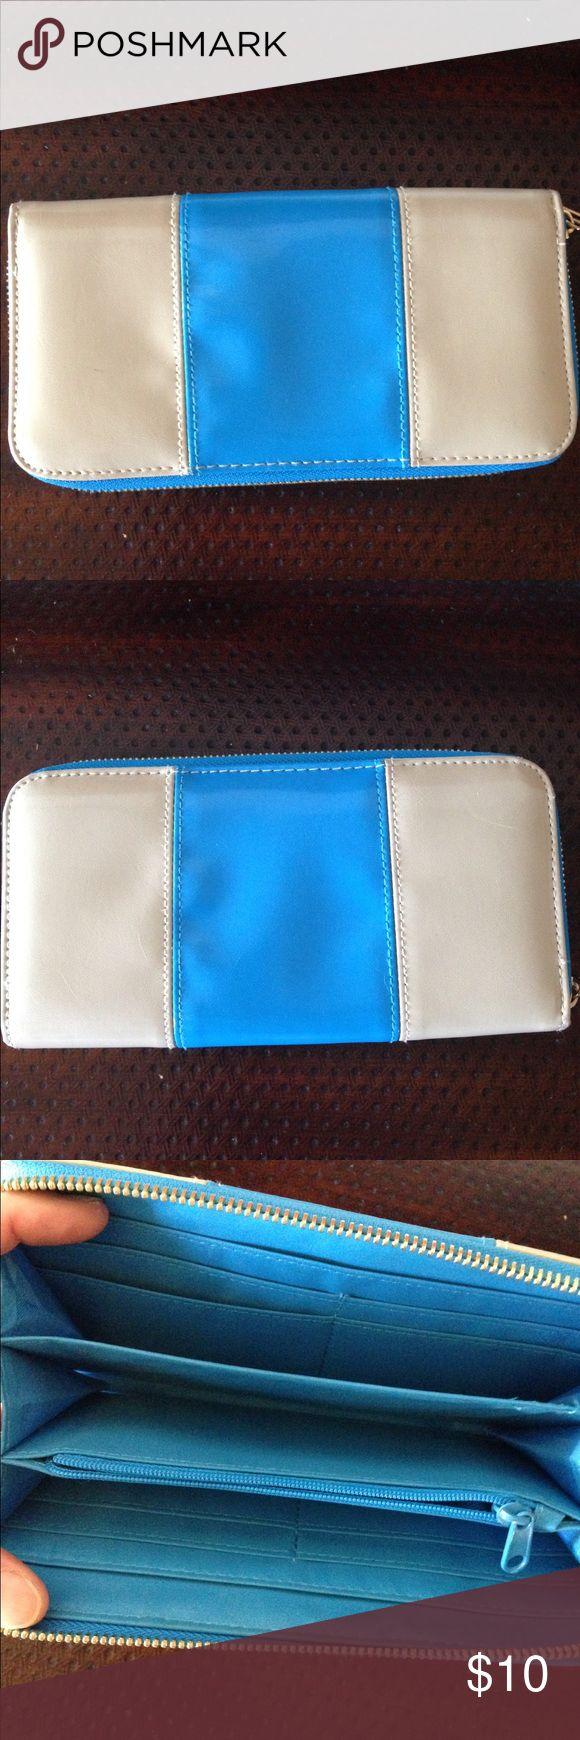 Cool wallet vegan leather 8x4 wallet nice clean wallet classic stripe looks like mini cooper Bags Wallets